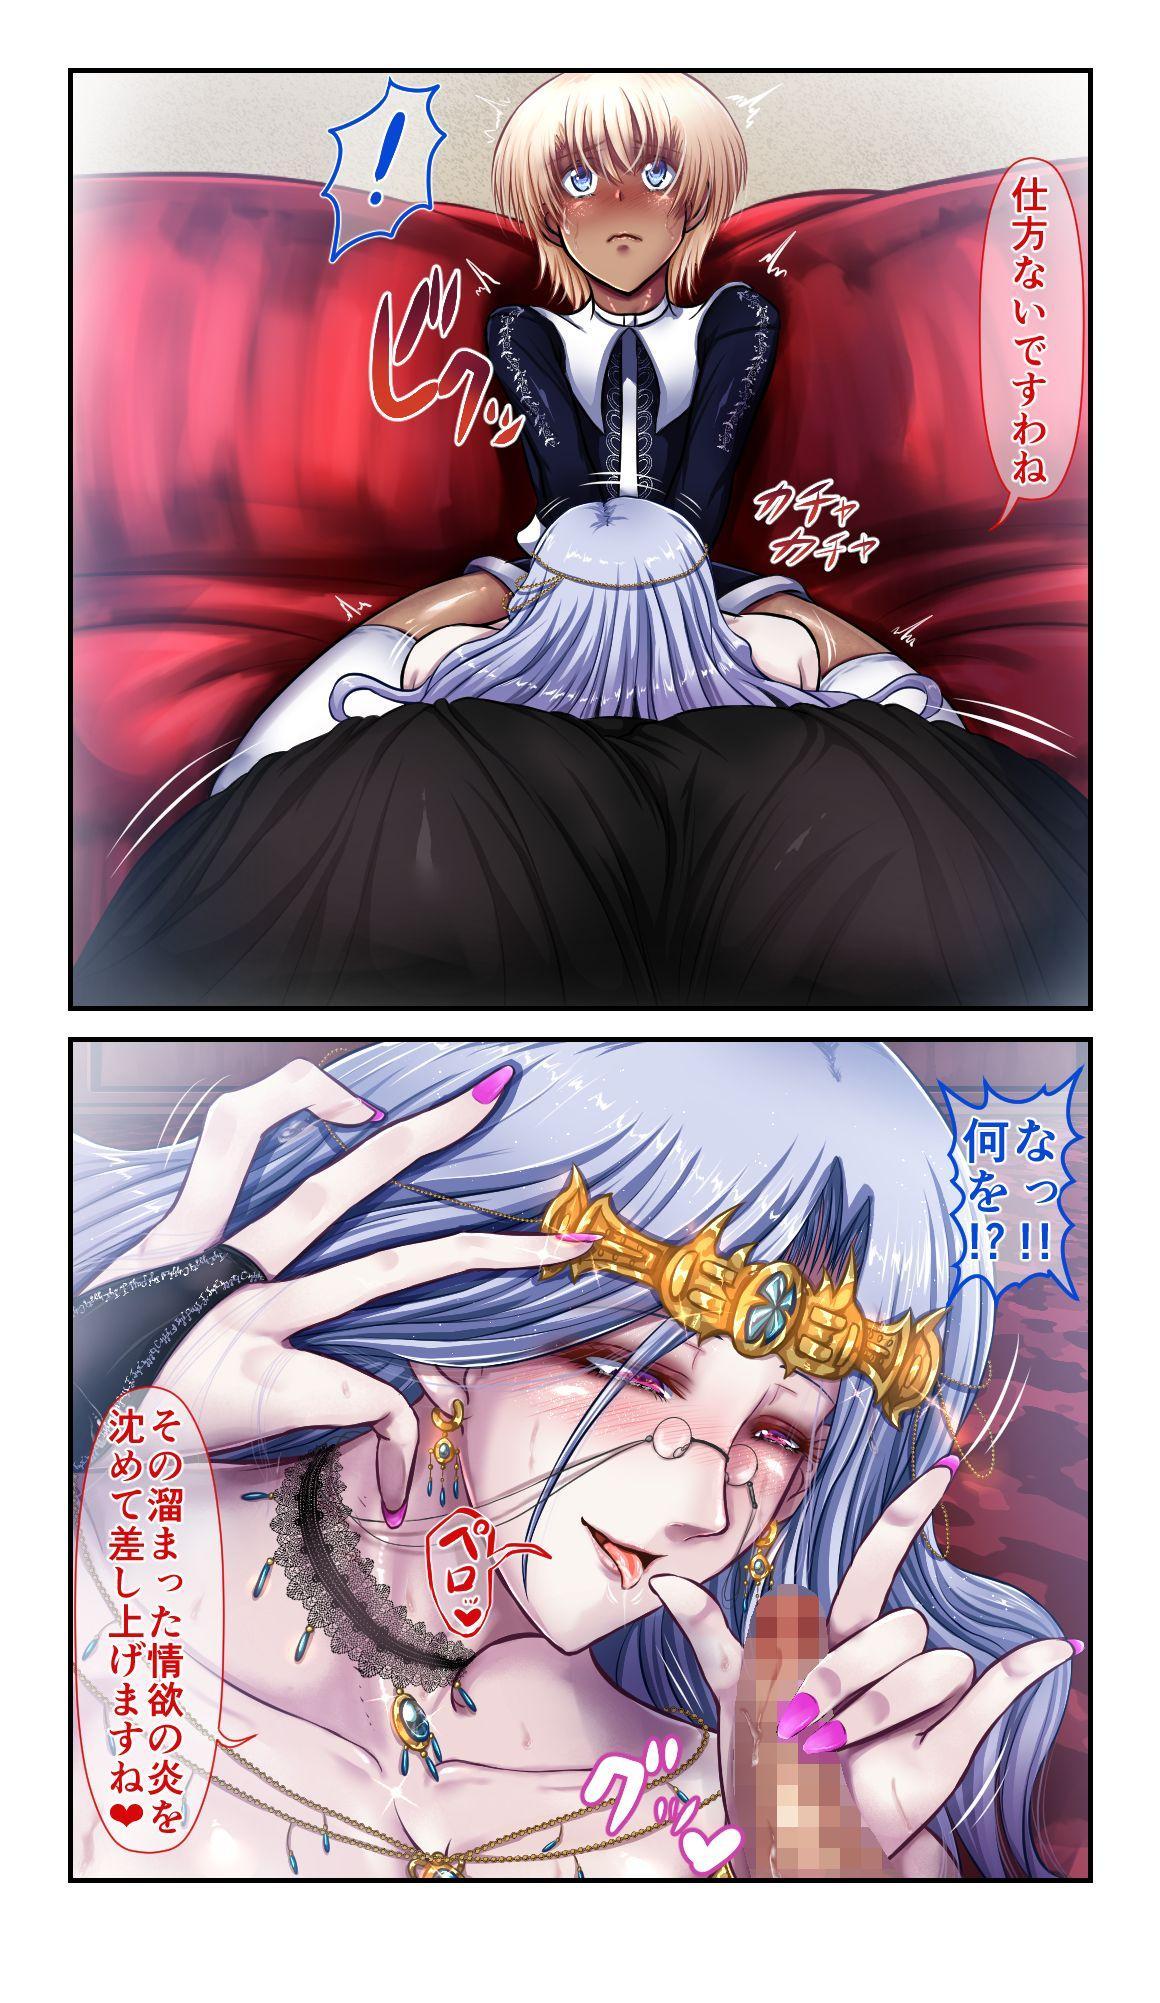 SweetEdda vol. 5 Nyuuma Hen Hitokui Chibusa no Mamelon 9